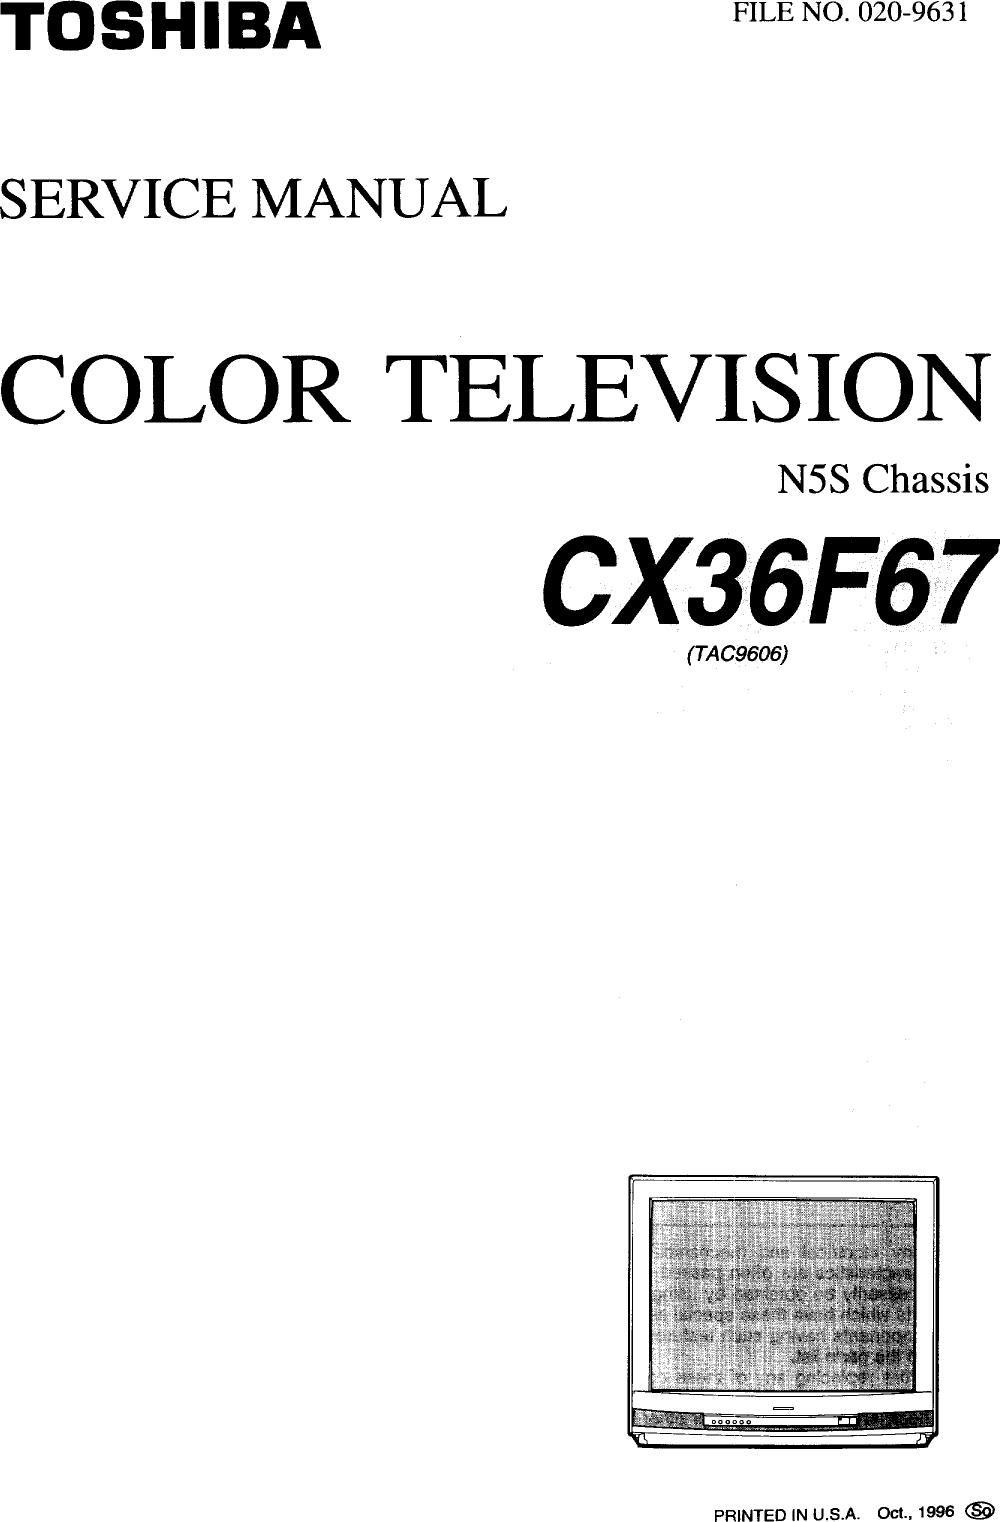 TOSHIBA Direct View Digital 27 To 40 TV Manual 97100266